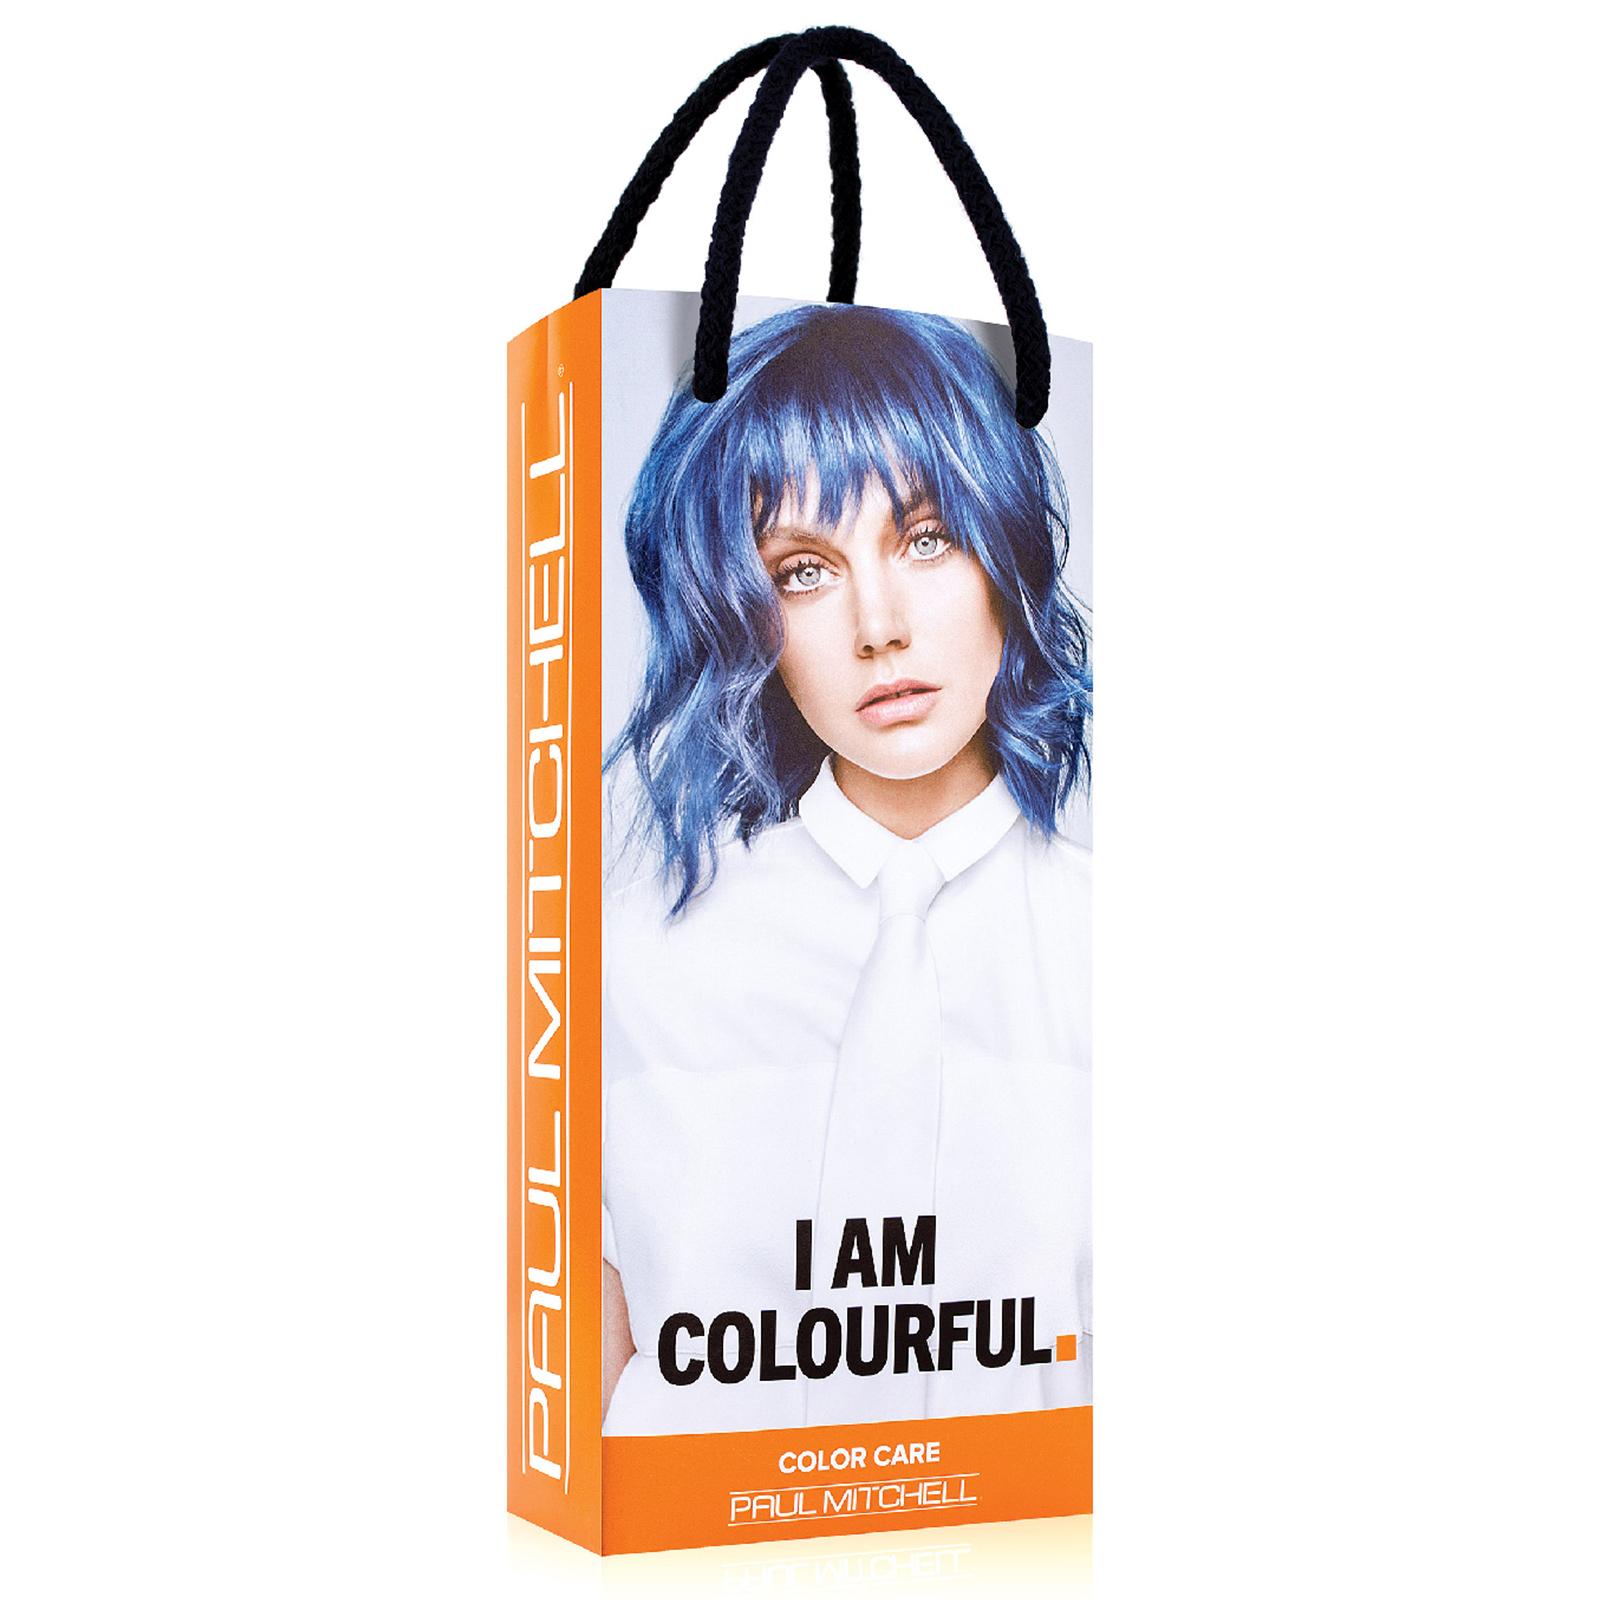 Paul Mitchell Color Care Bonus Bag I Am Colorful